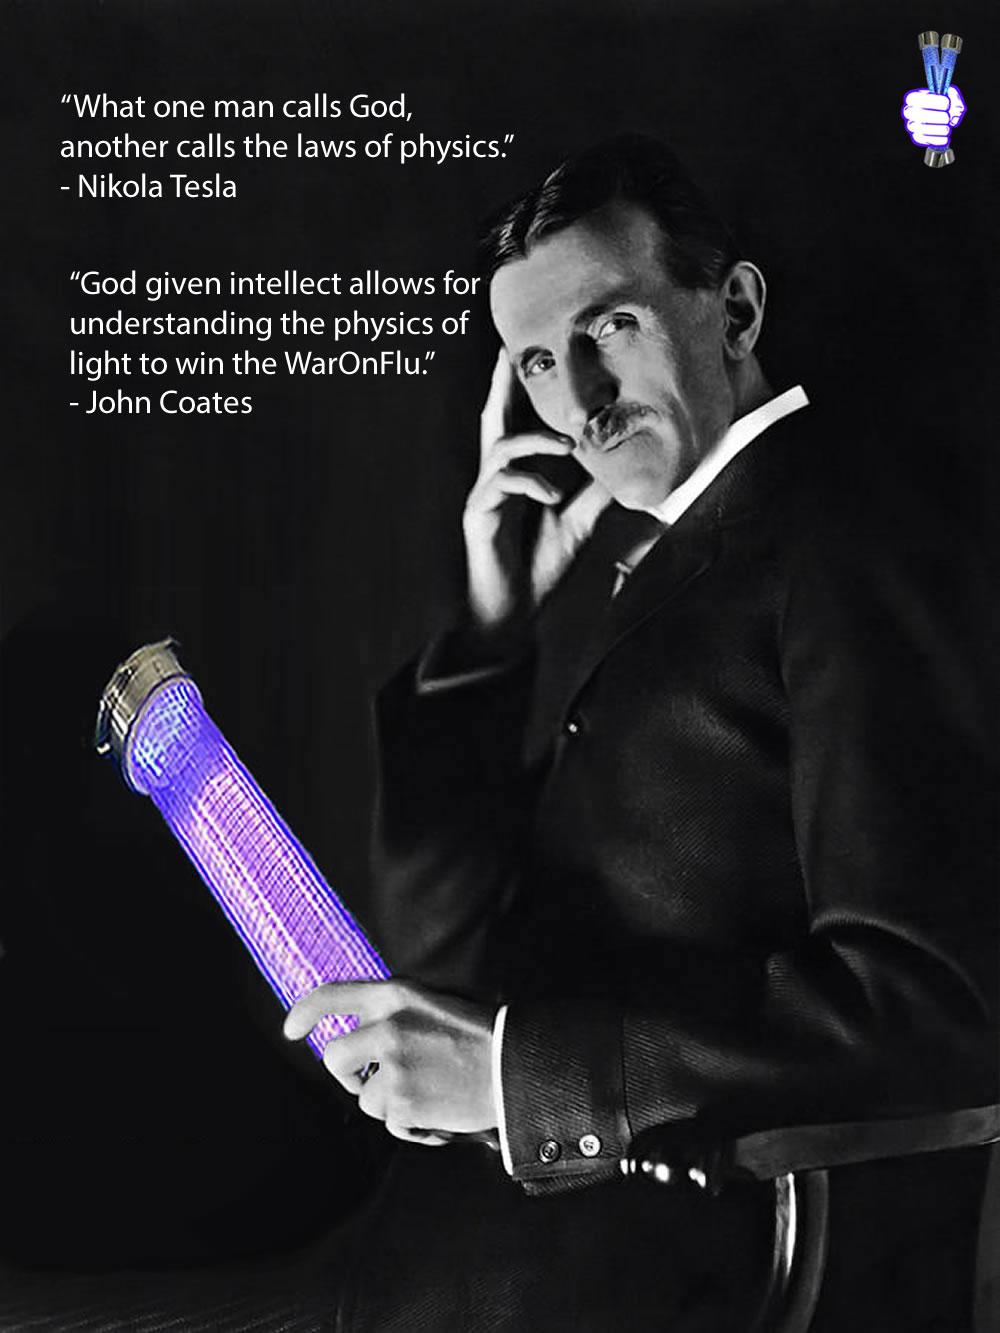 quantadose-new--Nikola-Tesla-far-uvc-222nm-Light-beam-shield-highlander-em-shield-war-on-flu-excimer-krcl-lamps-high-frequency-virus-shield